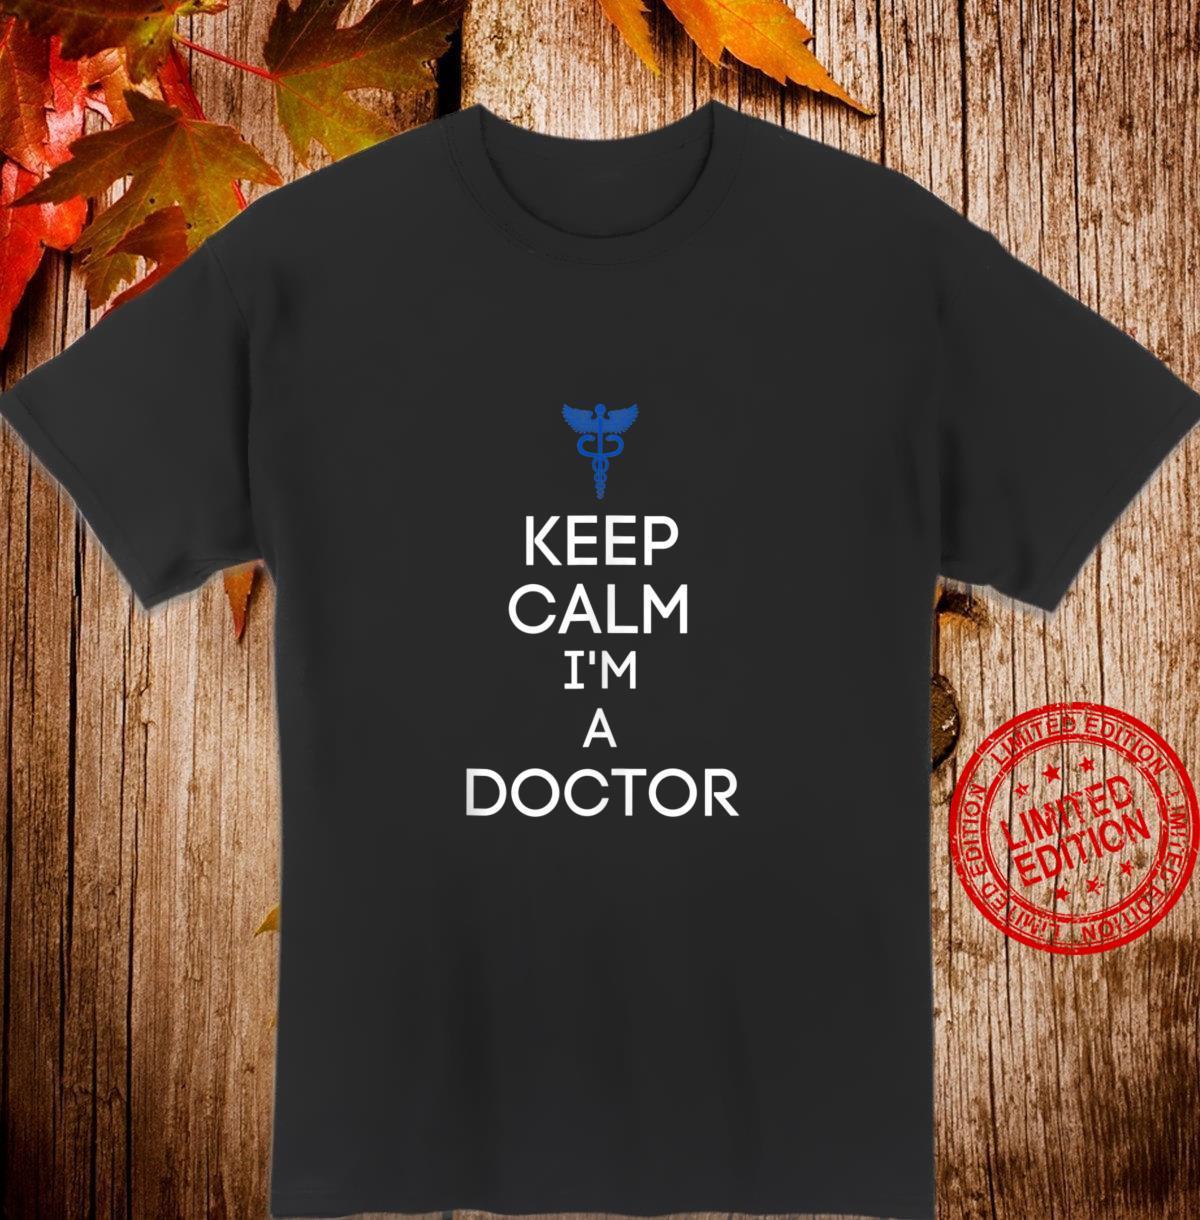 Keep Calm I'm A Doctor Shirt Doctor Shirt